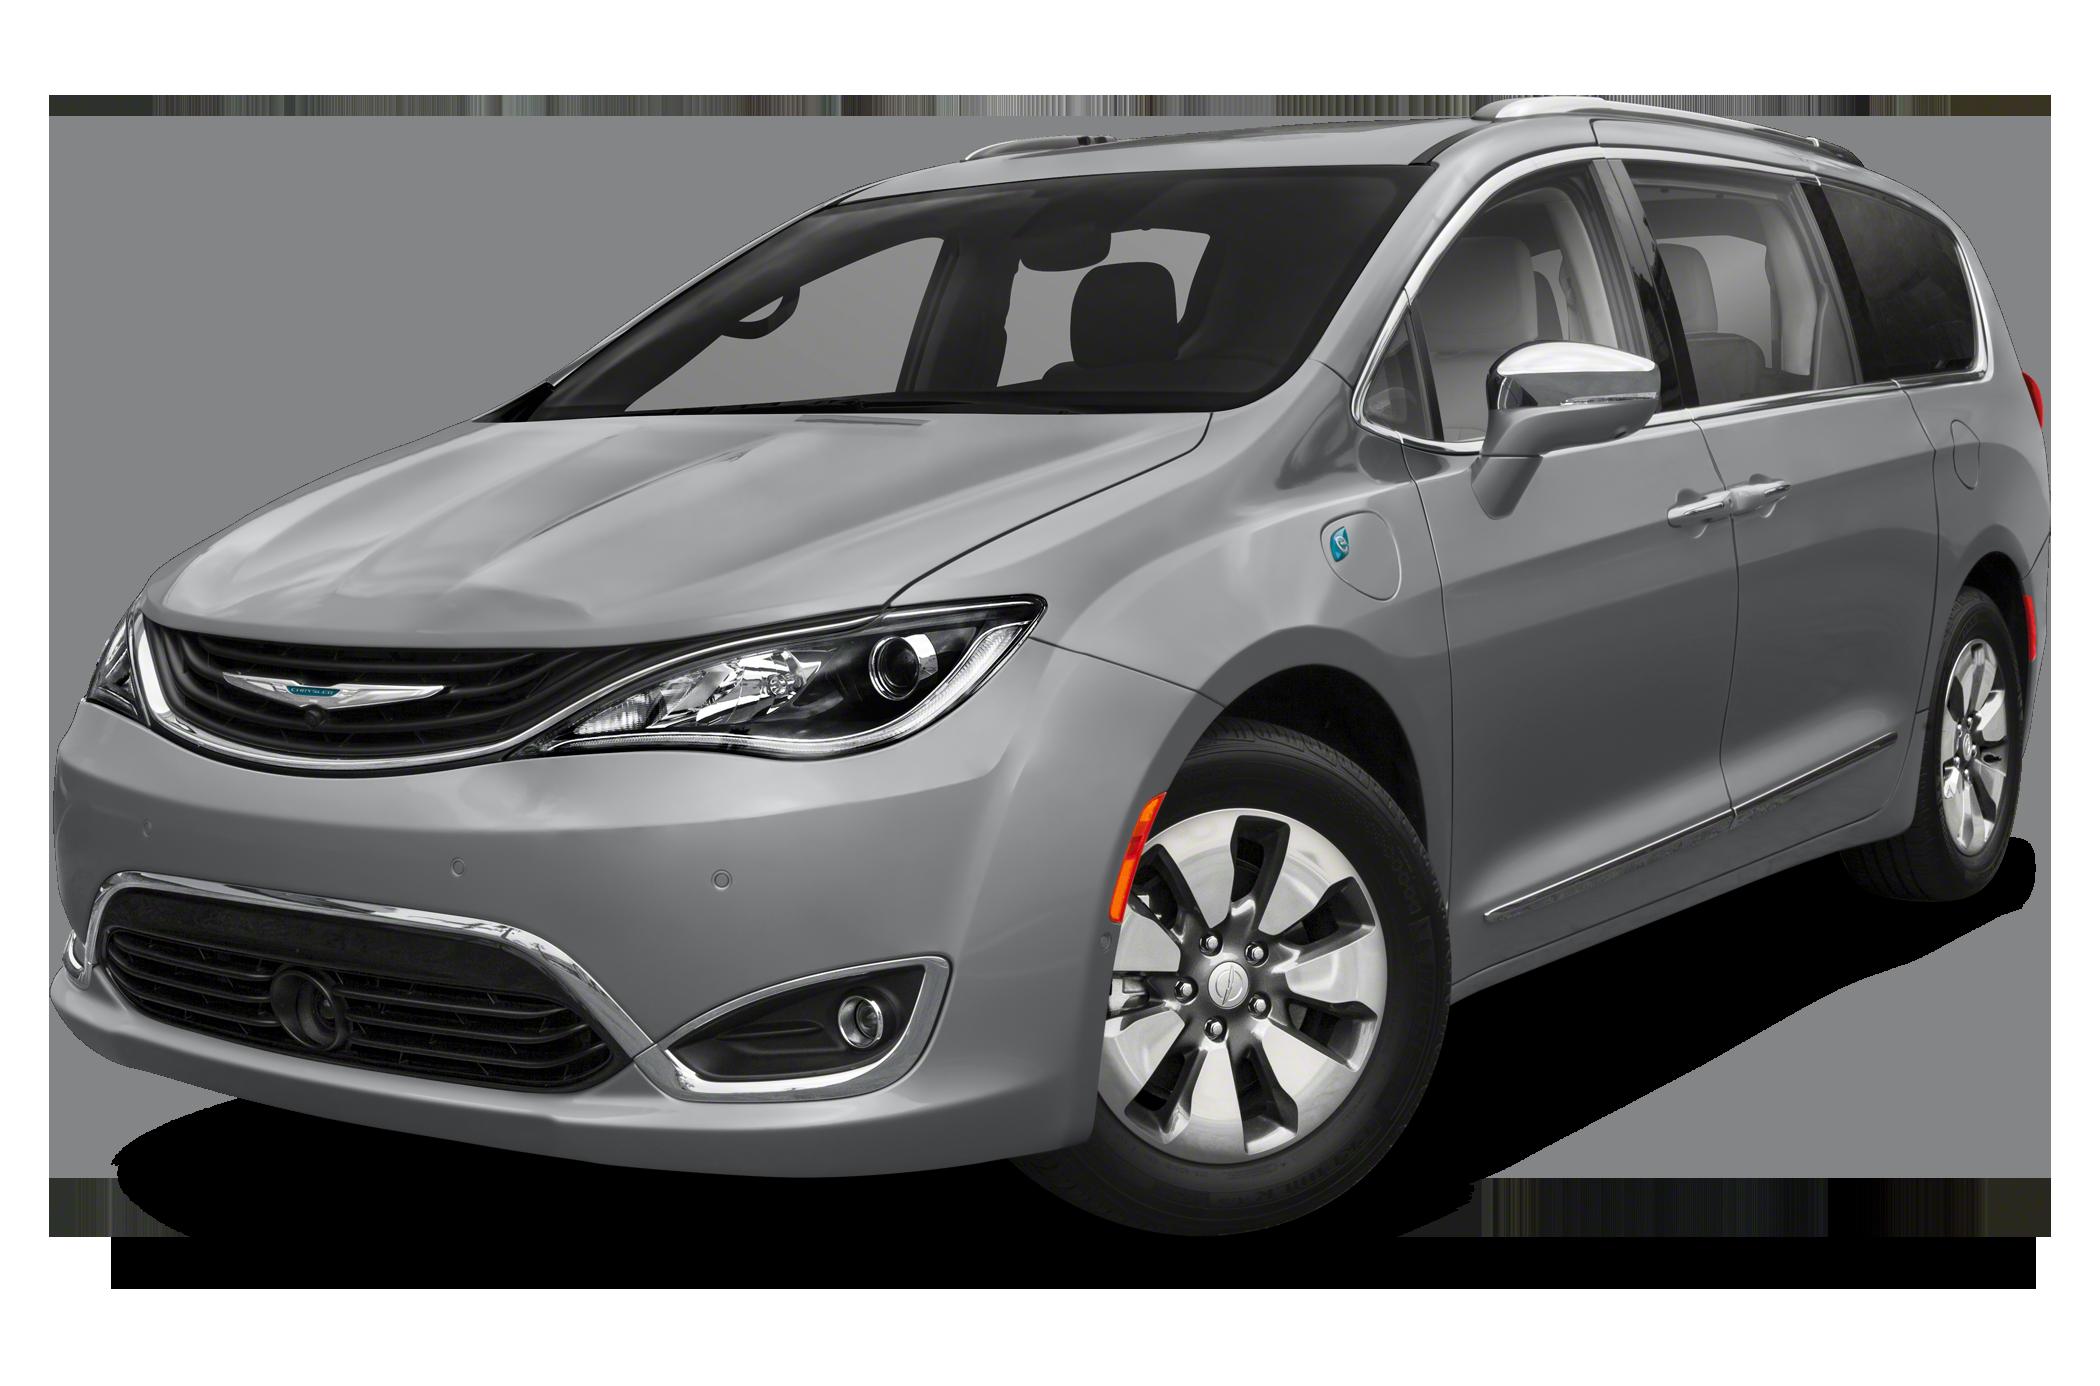 Crv Lease Deals >> Compare Chrysler/Pacifica-hybrid